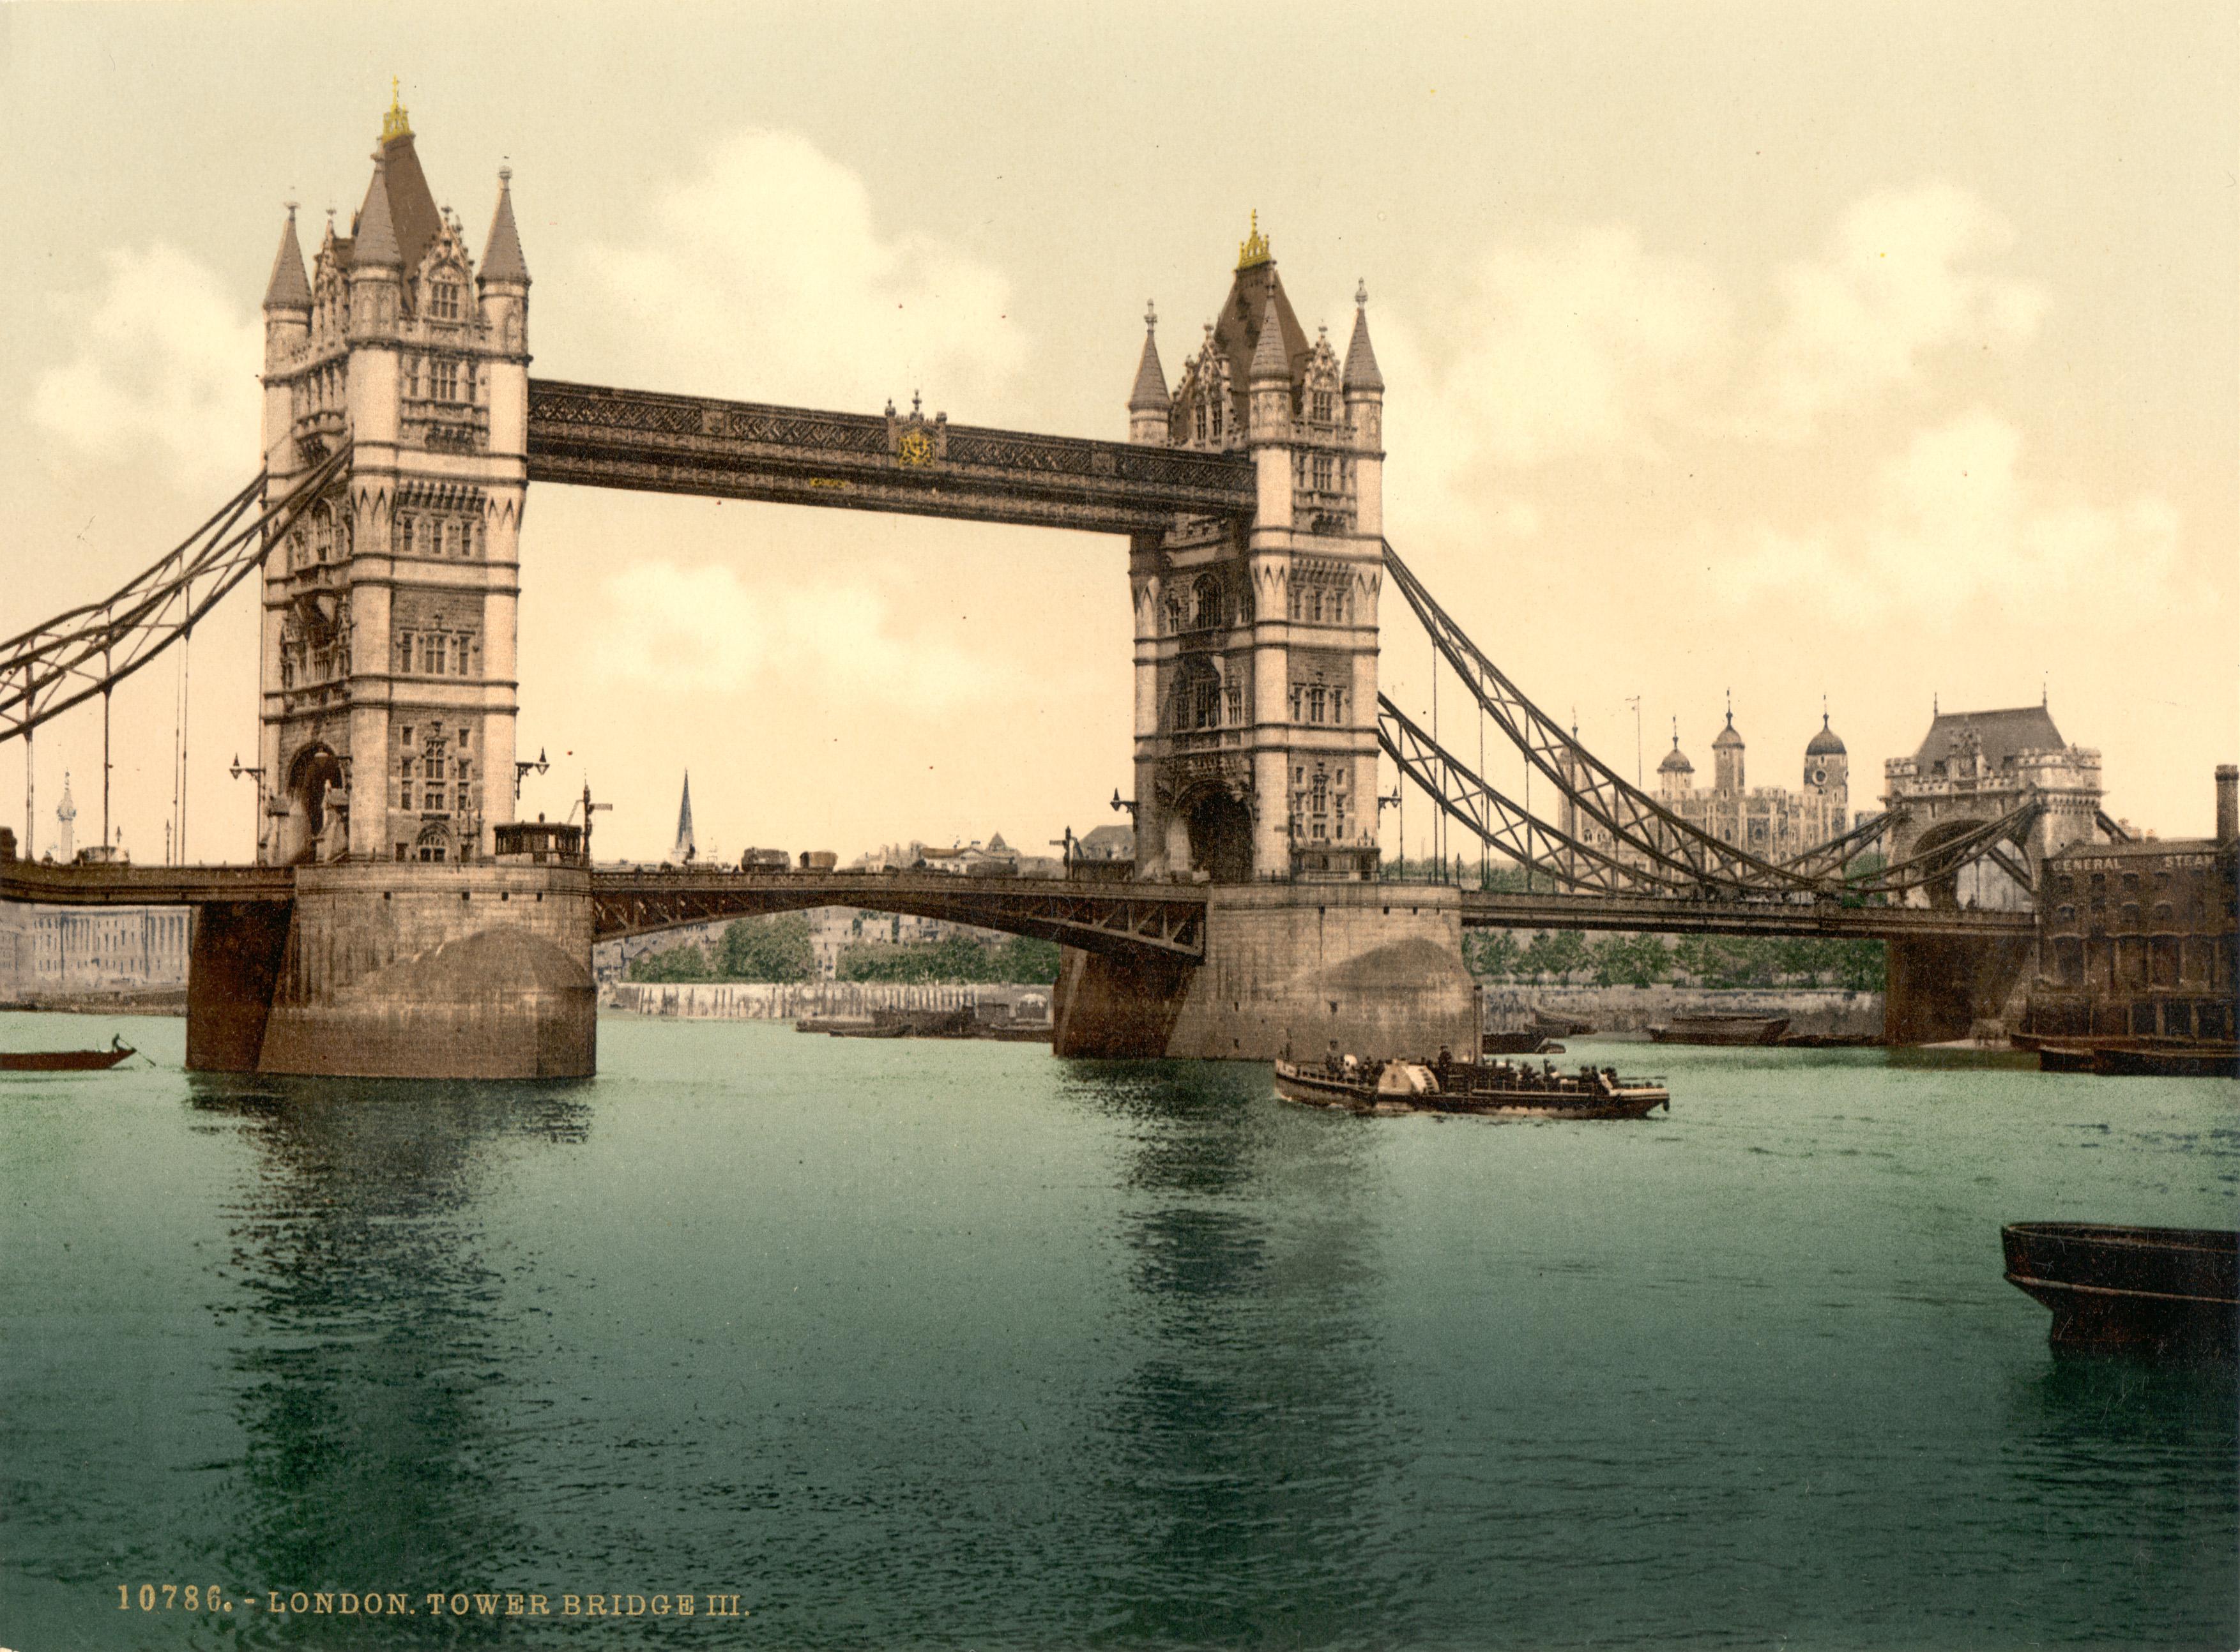 Images of Tower Bridge London England File:tower Bridge Iii